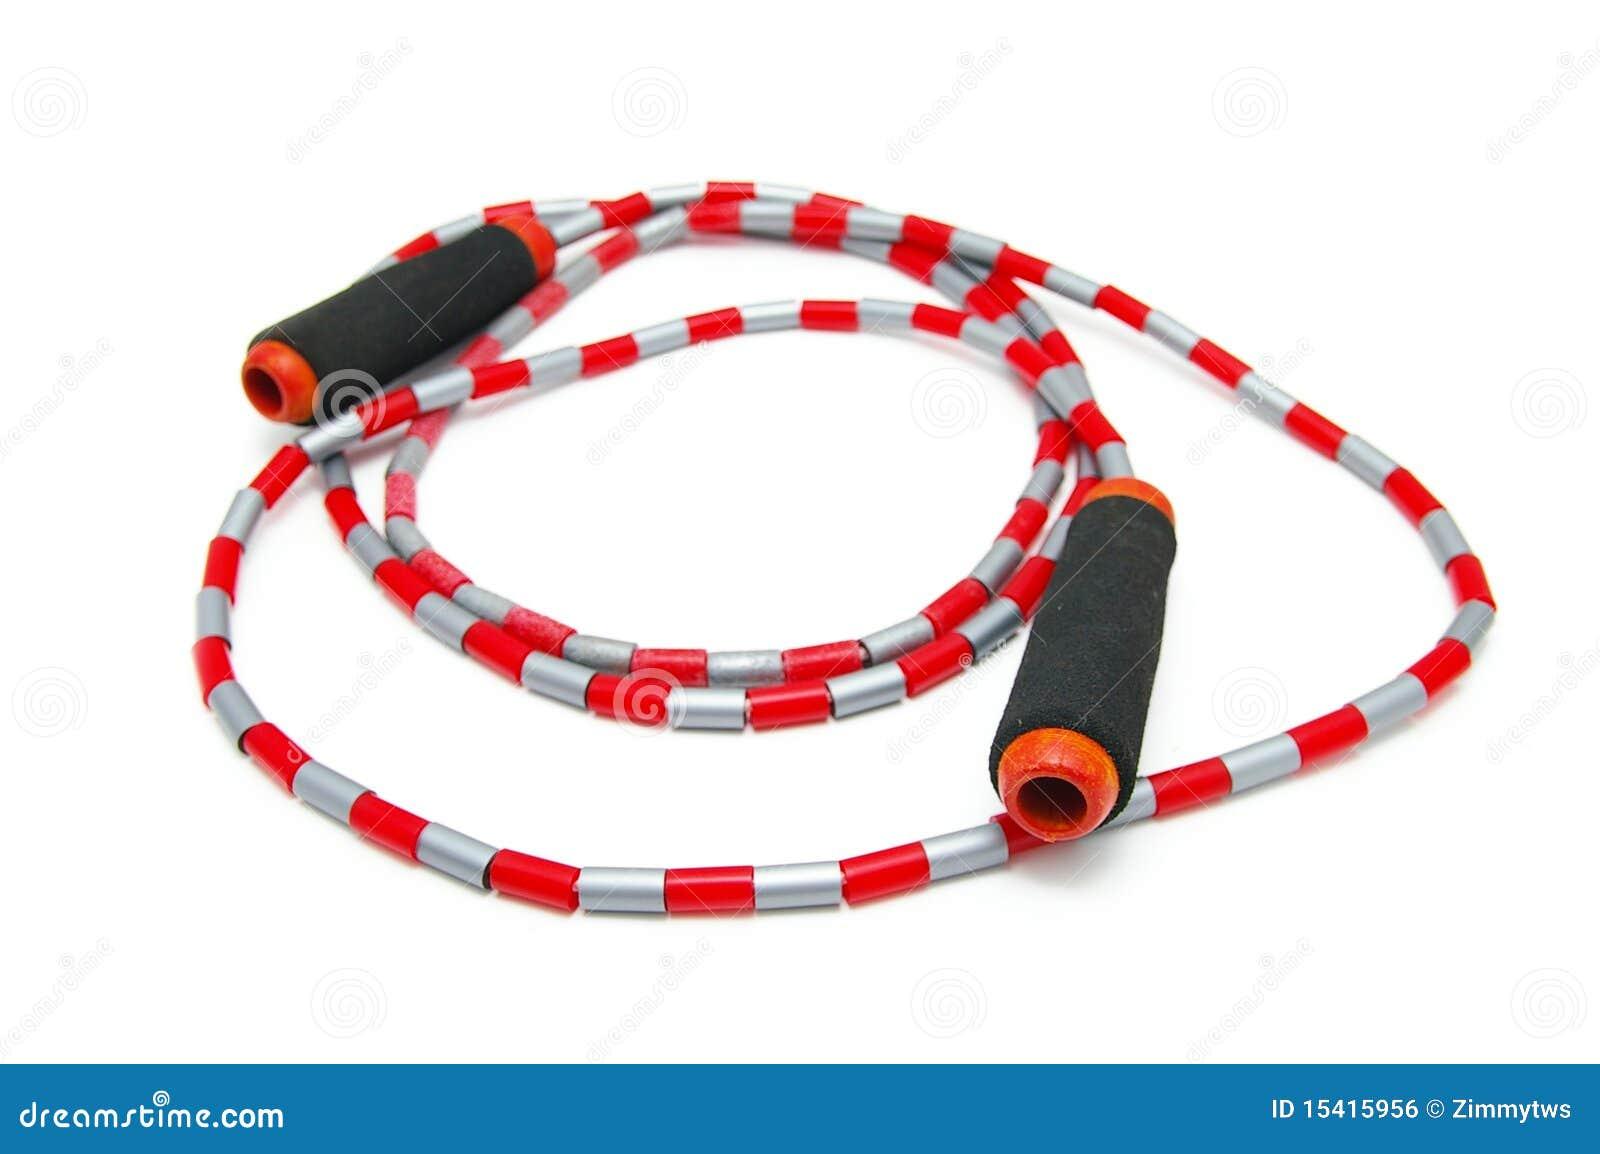 Jump Rope Royalty Free Stock Image - Image: 15415956